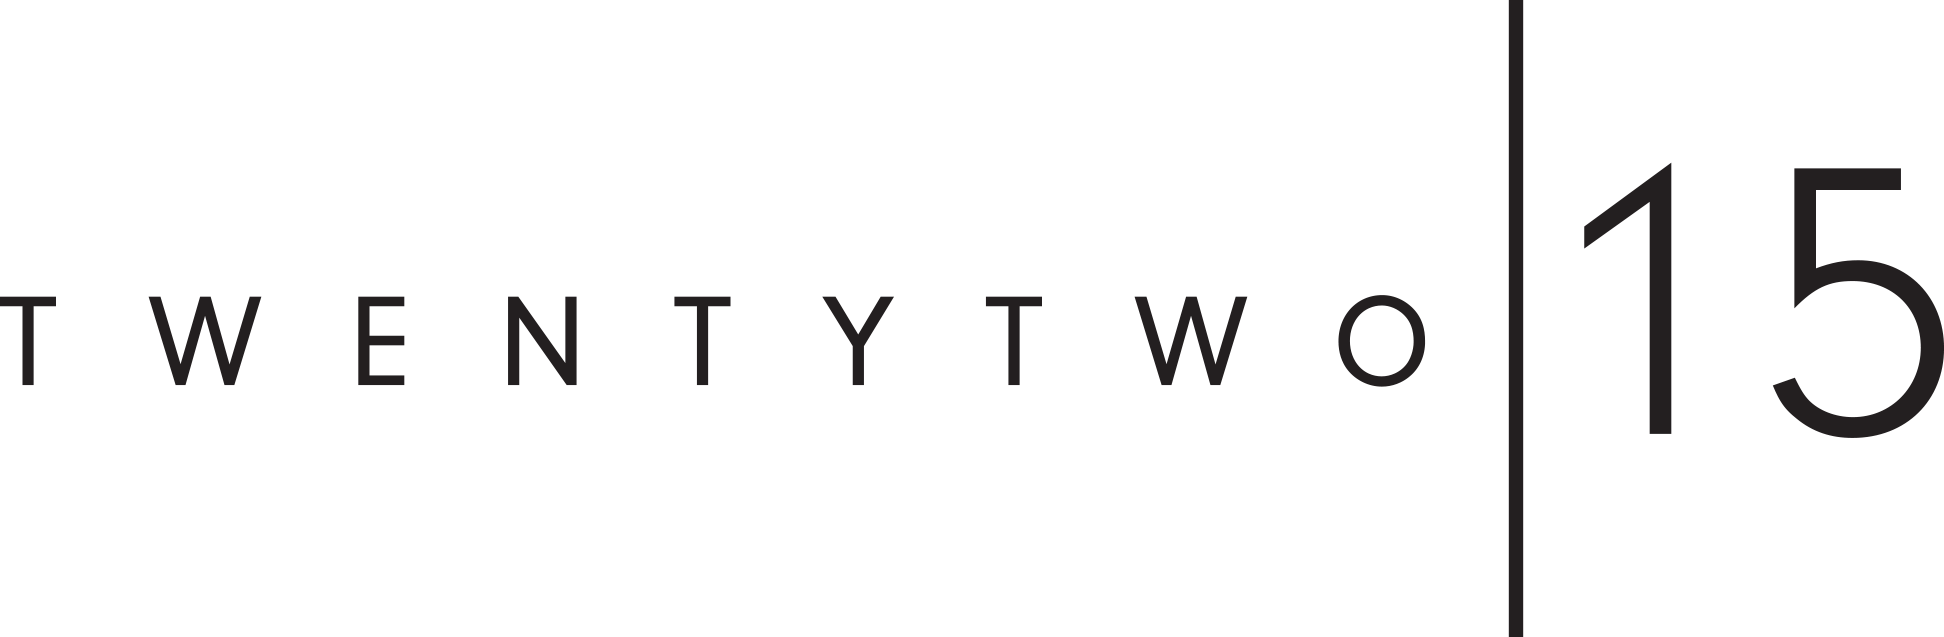 TwentyTwo15-Logo-white background.png